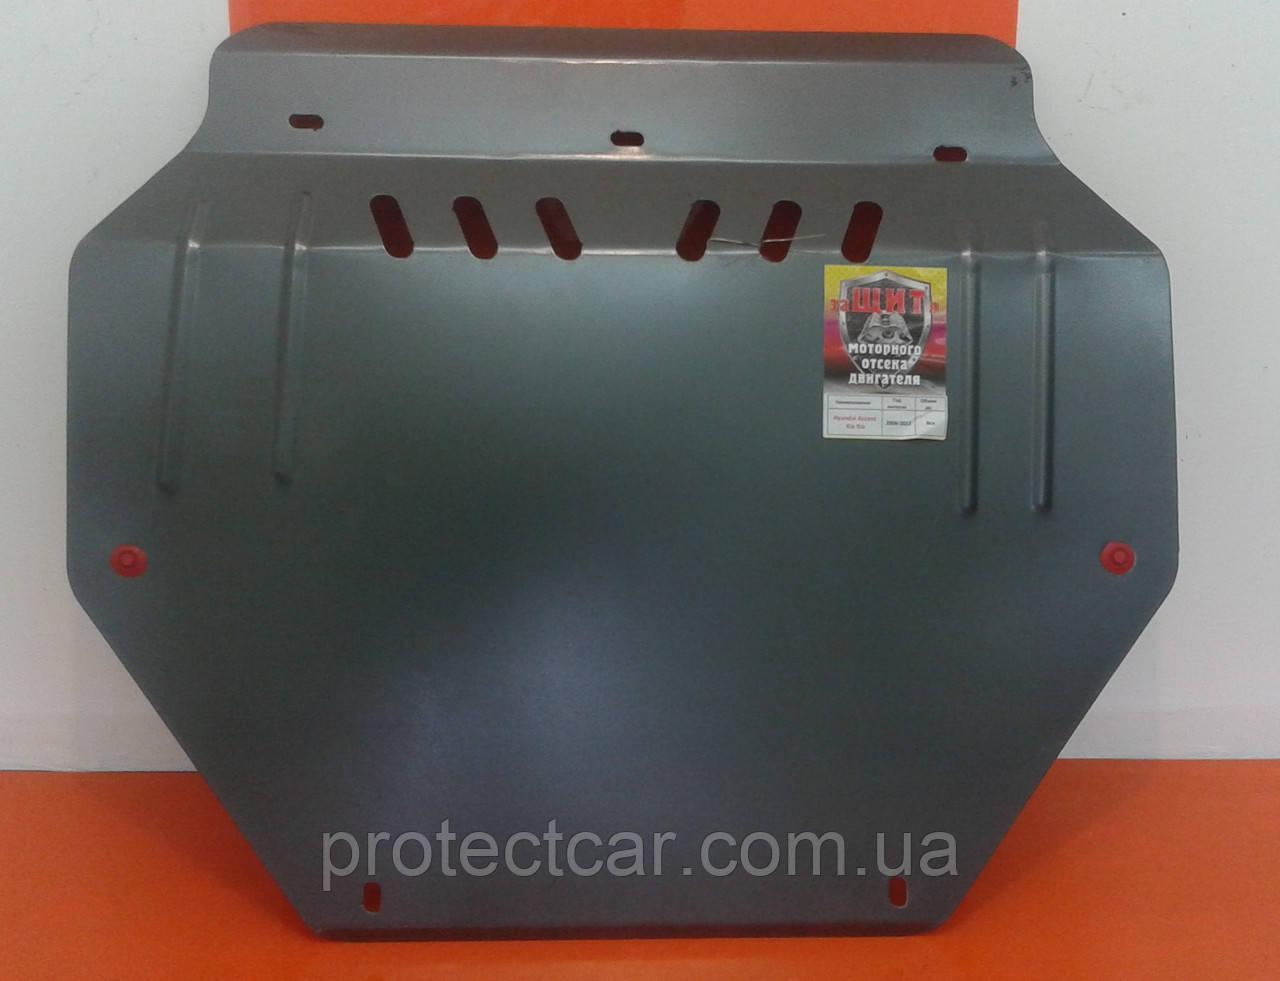 Захист двигуна Hyundai ACCENT (2006-2011) Акцент